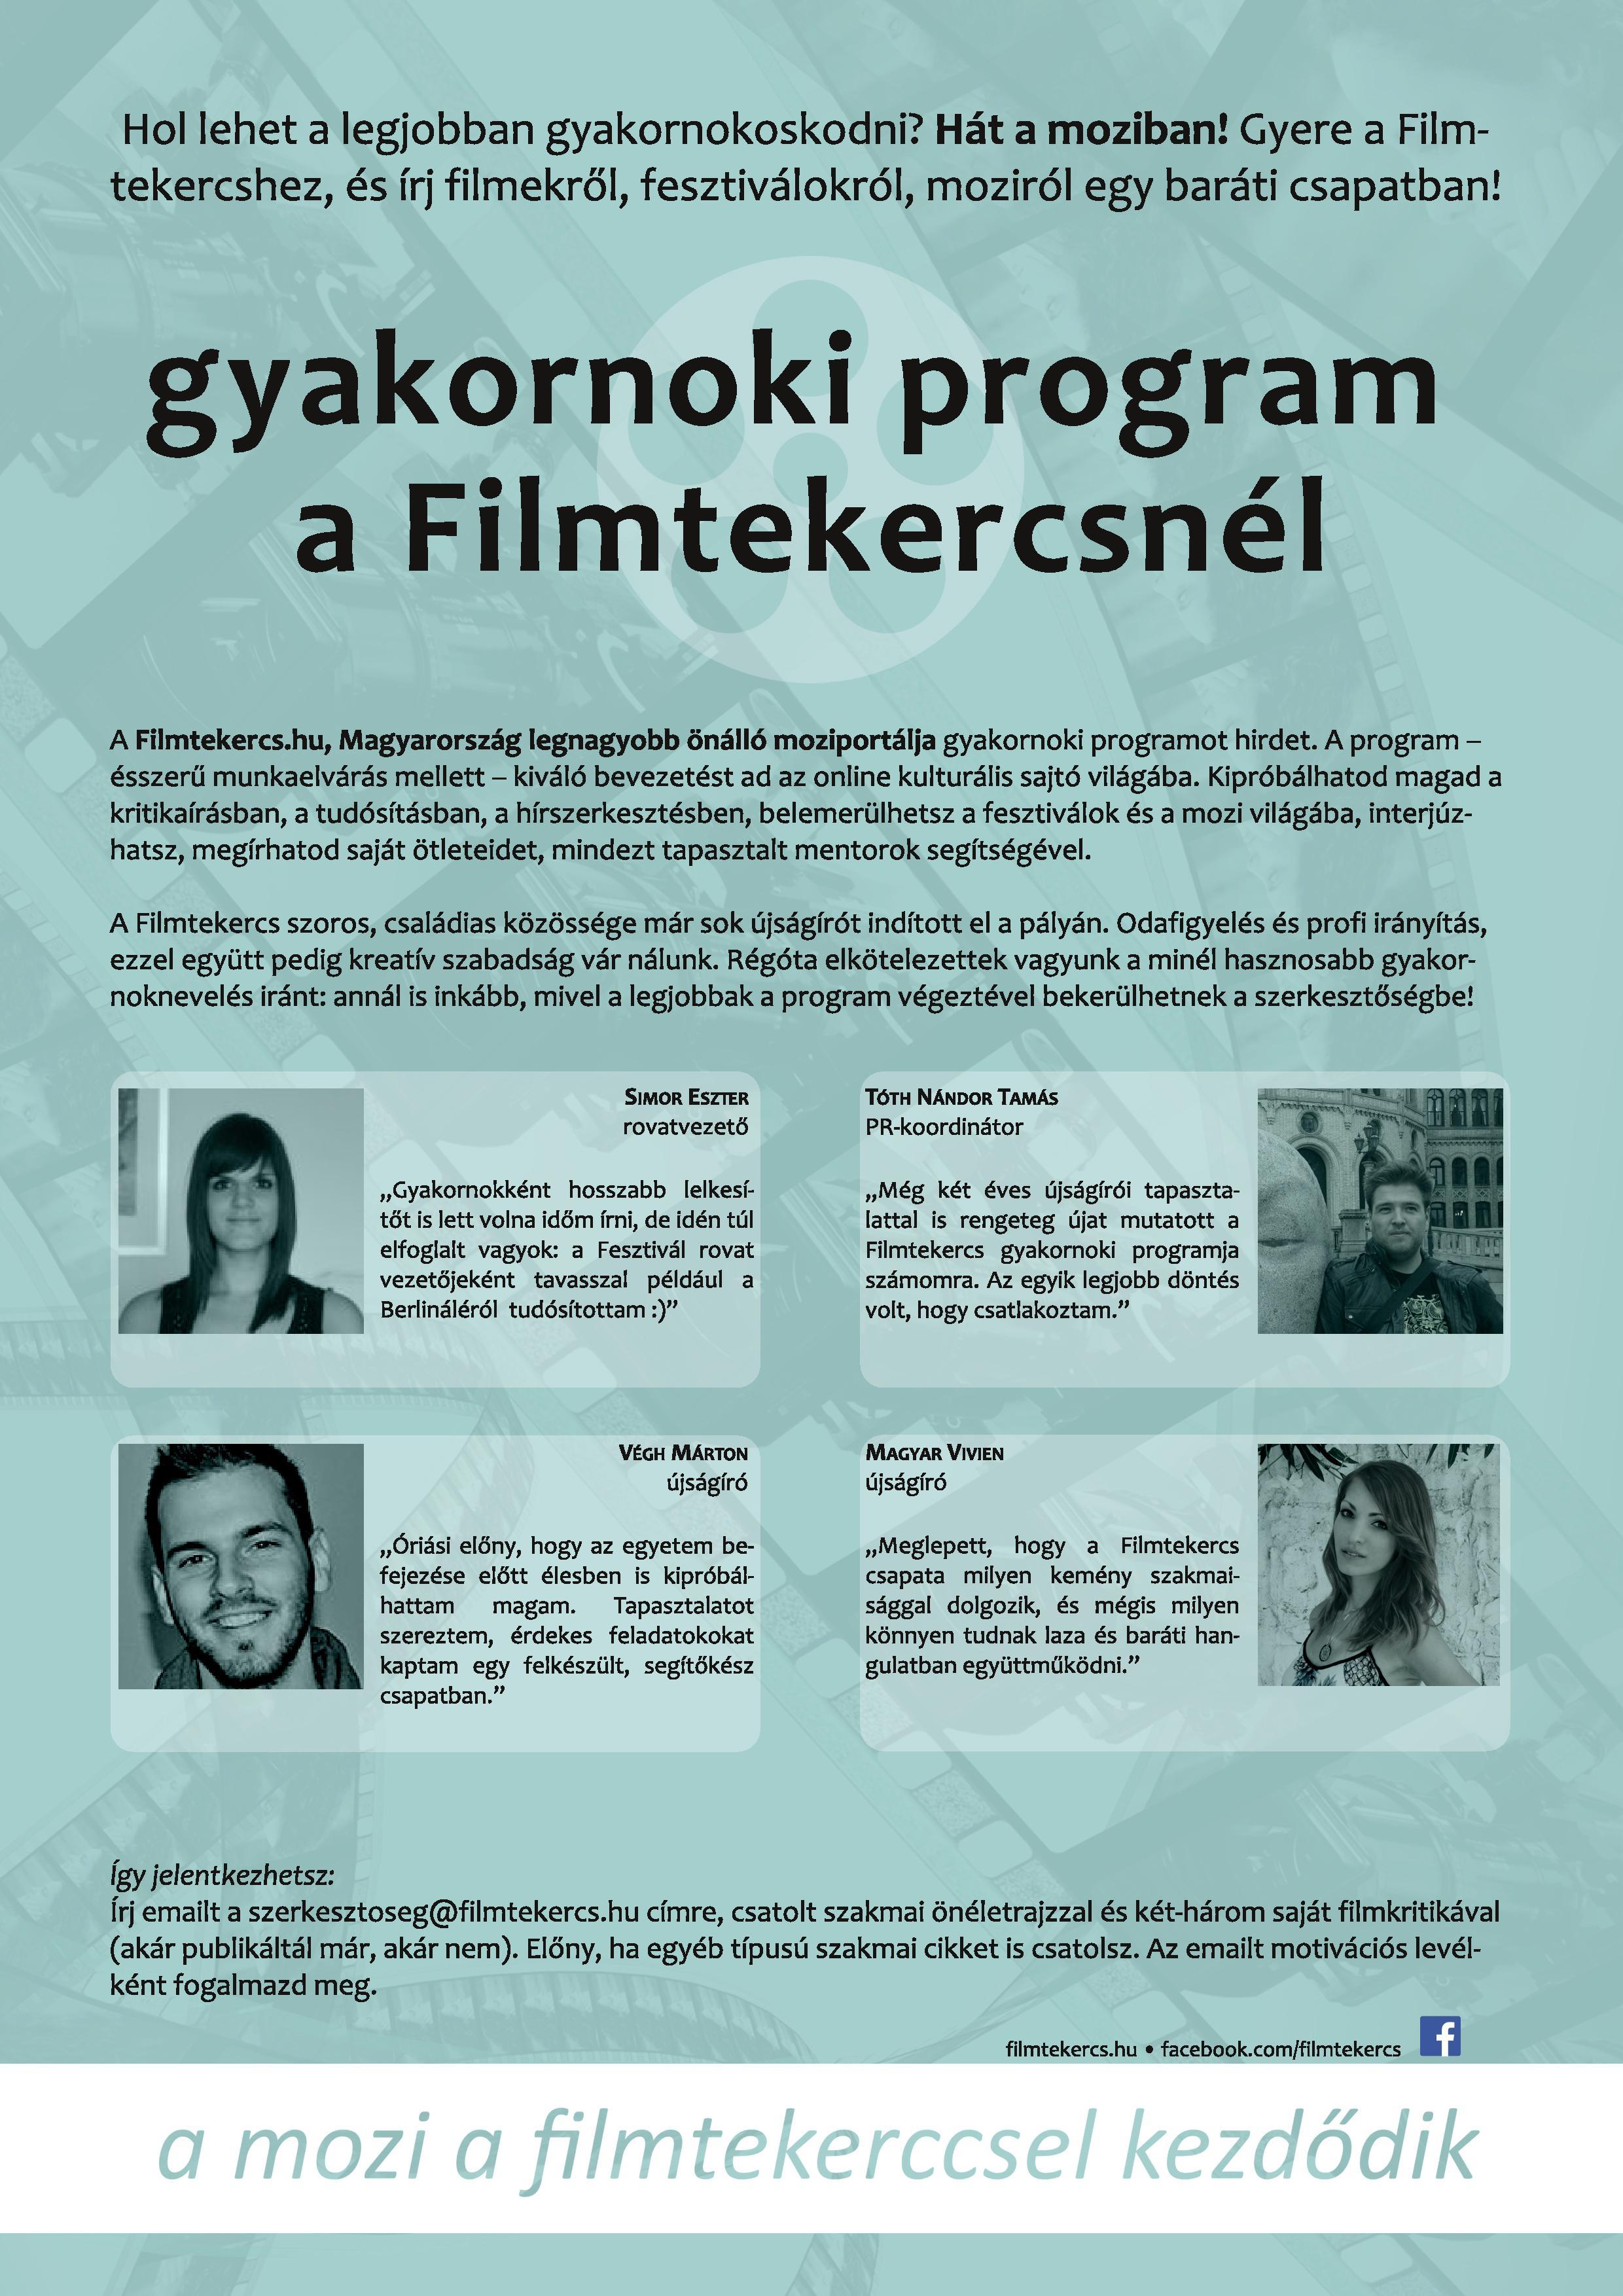 Gyakornoki program (Filmtekercs.hu)